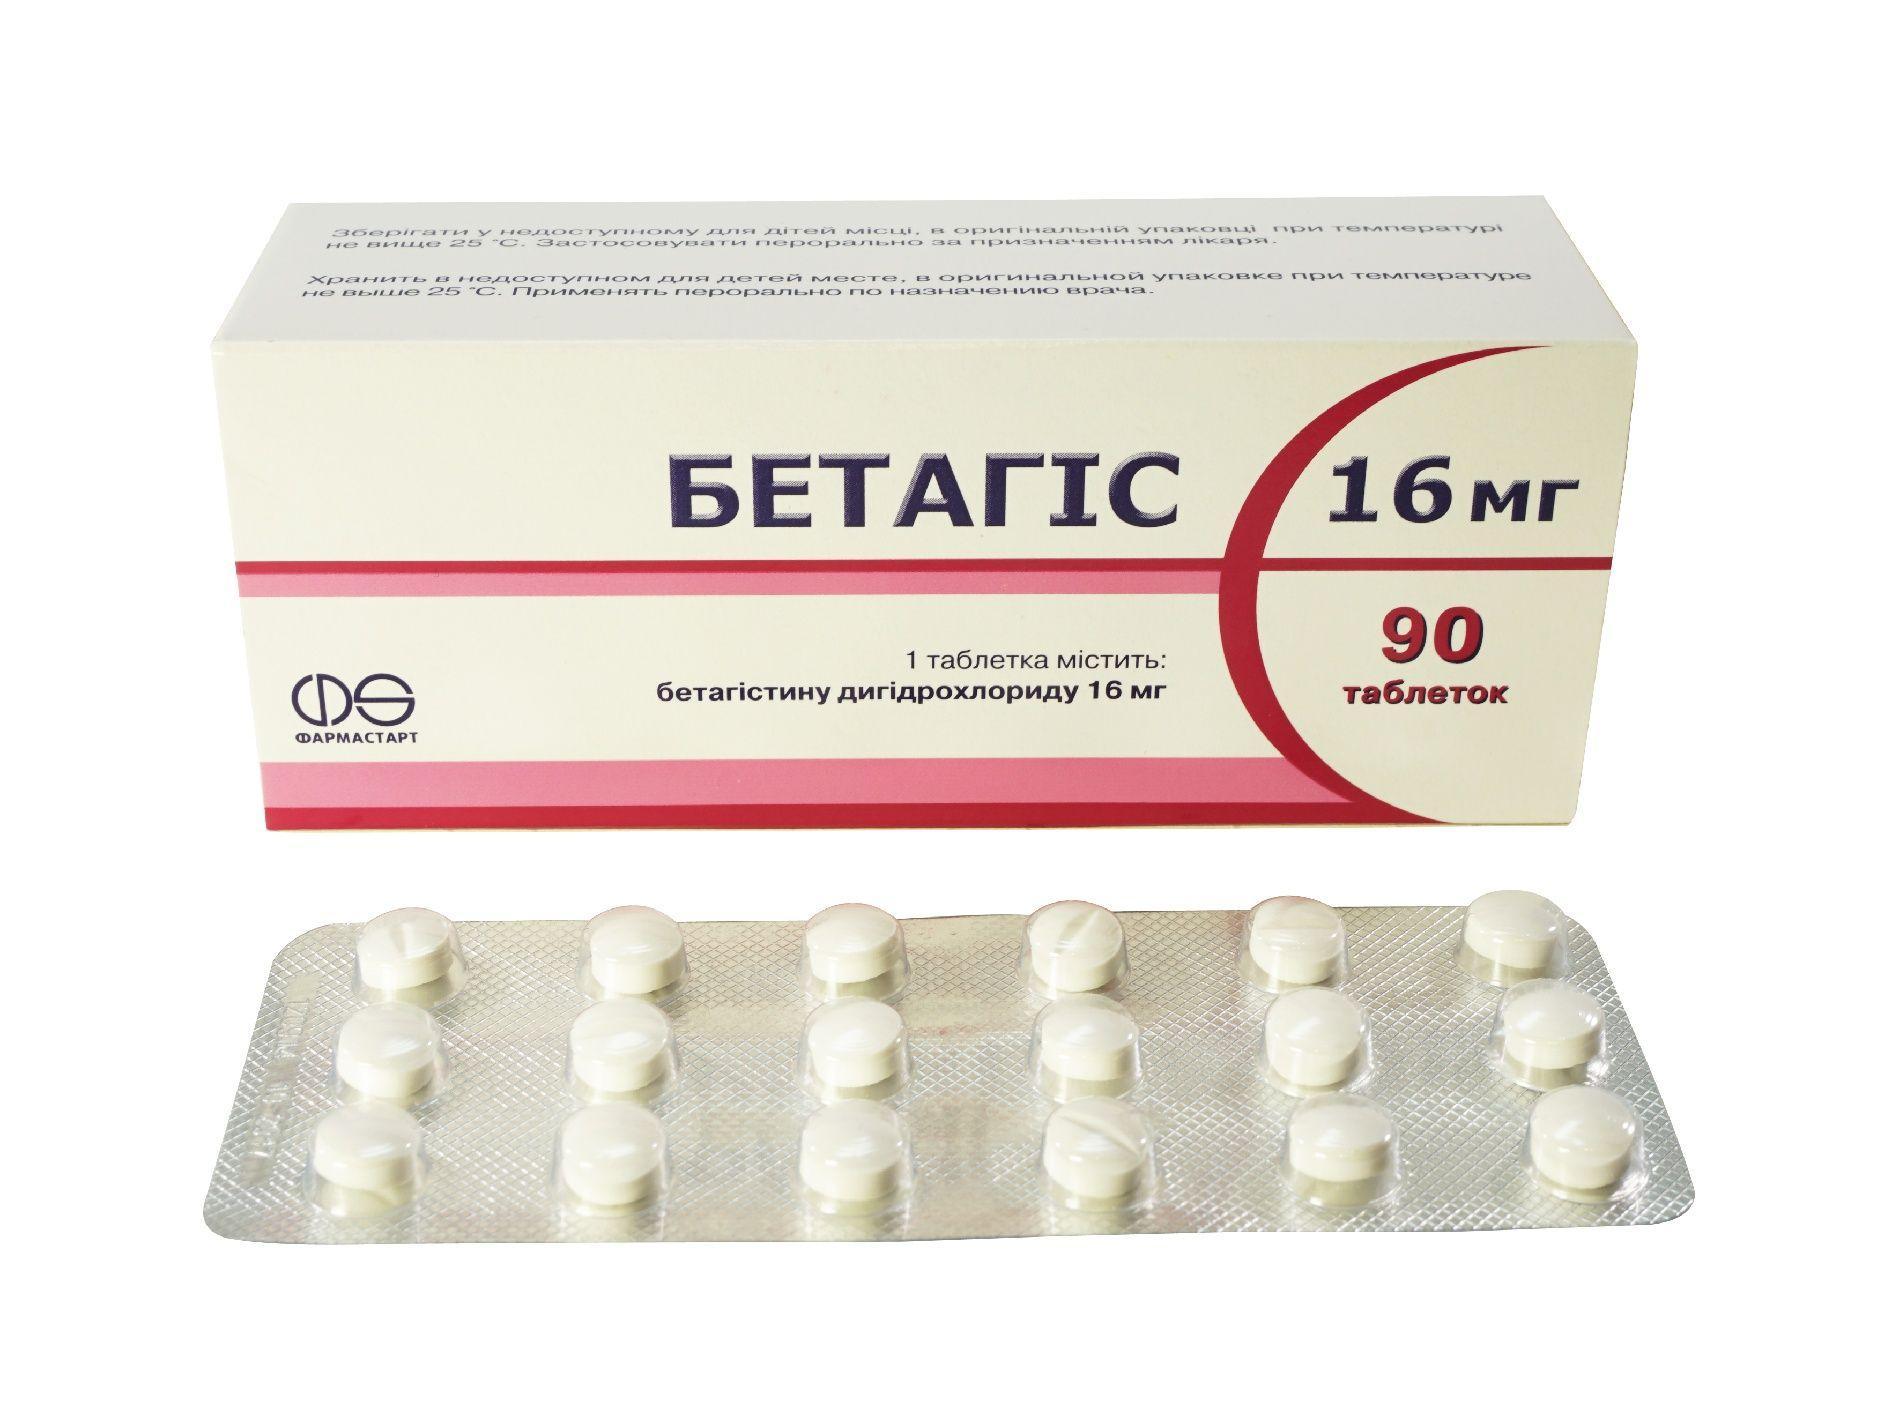 Бетагис 16 мг №90 таблетки_6005db2e3bb24.jpeg